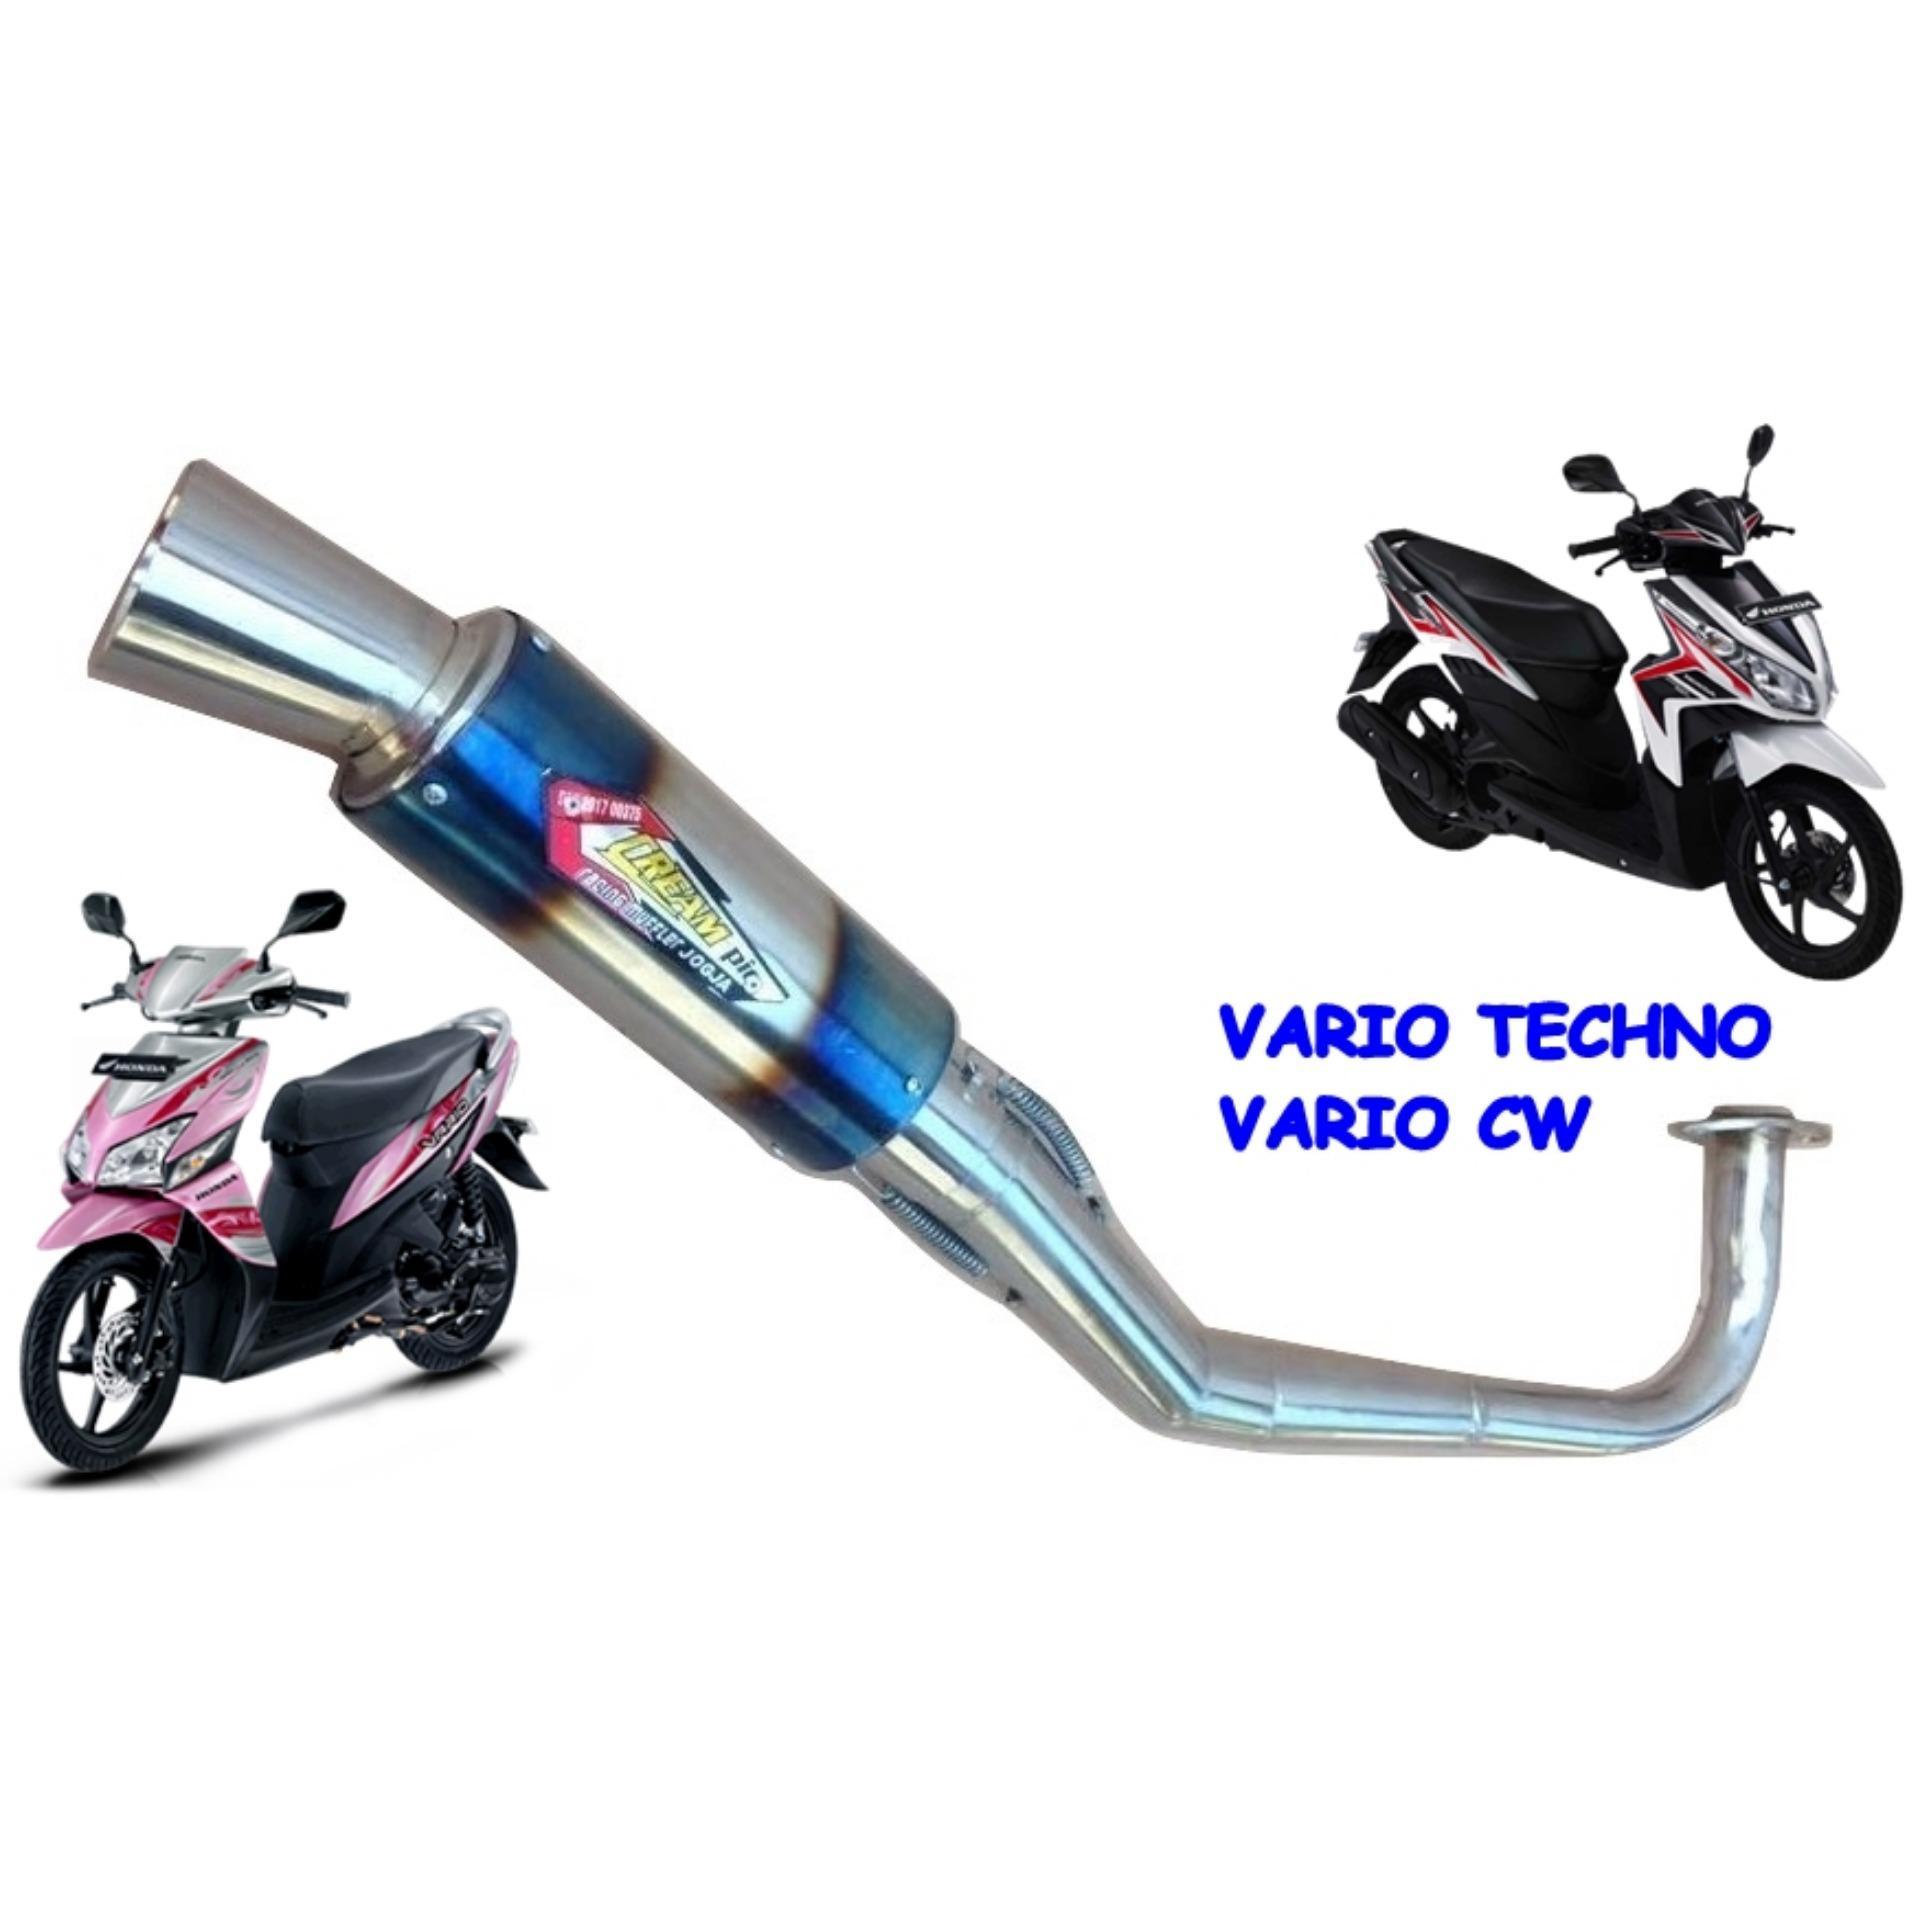 Knalpot Motor VARIO TECHNO & CW 110 - CREAMPIE - BIRU